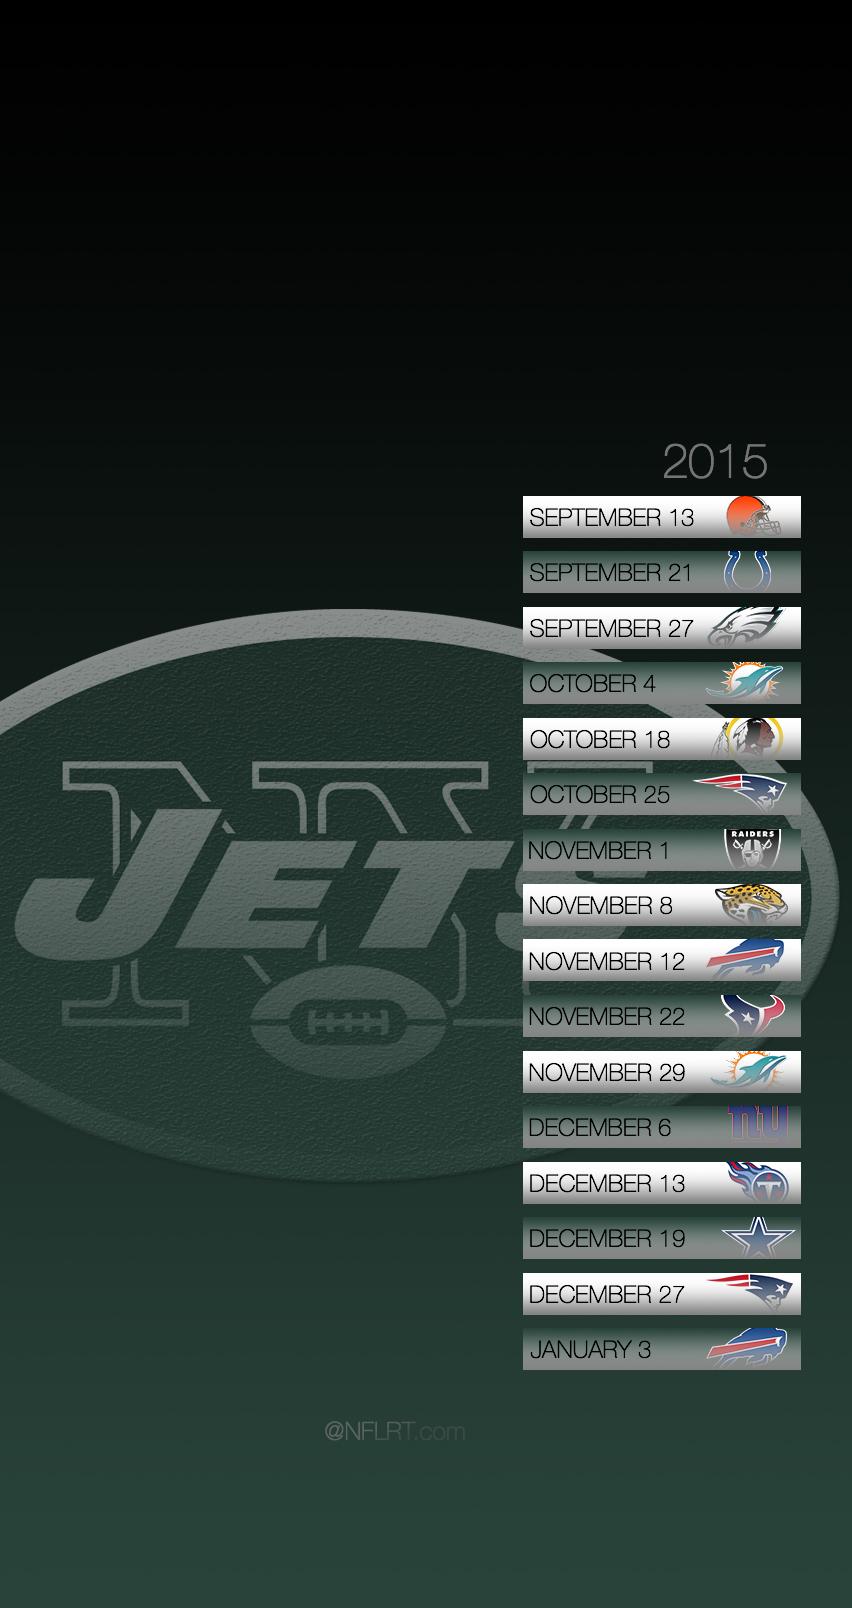 50 Ny Jets Wallpaper 2015 Schedule On Wallpapersafari